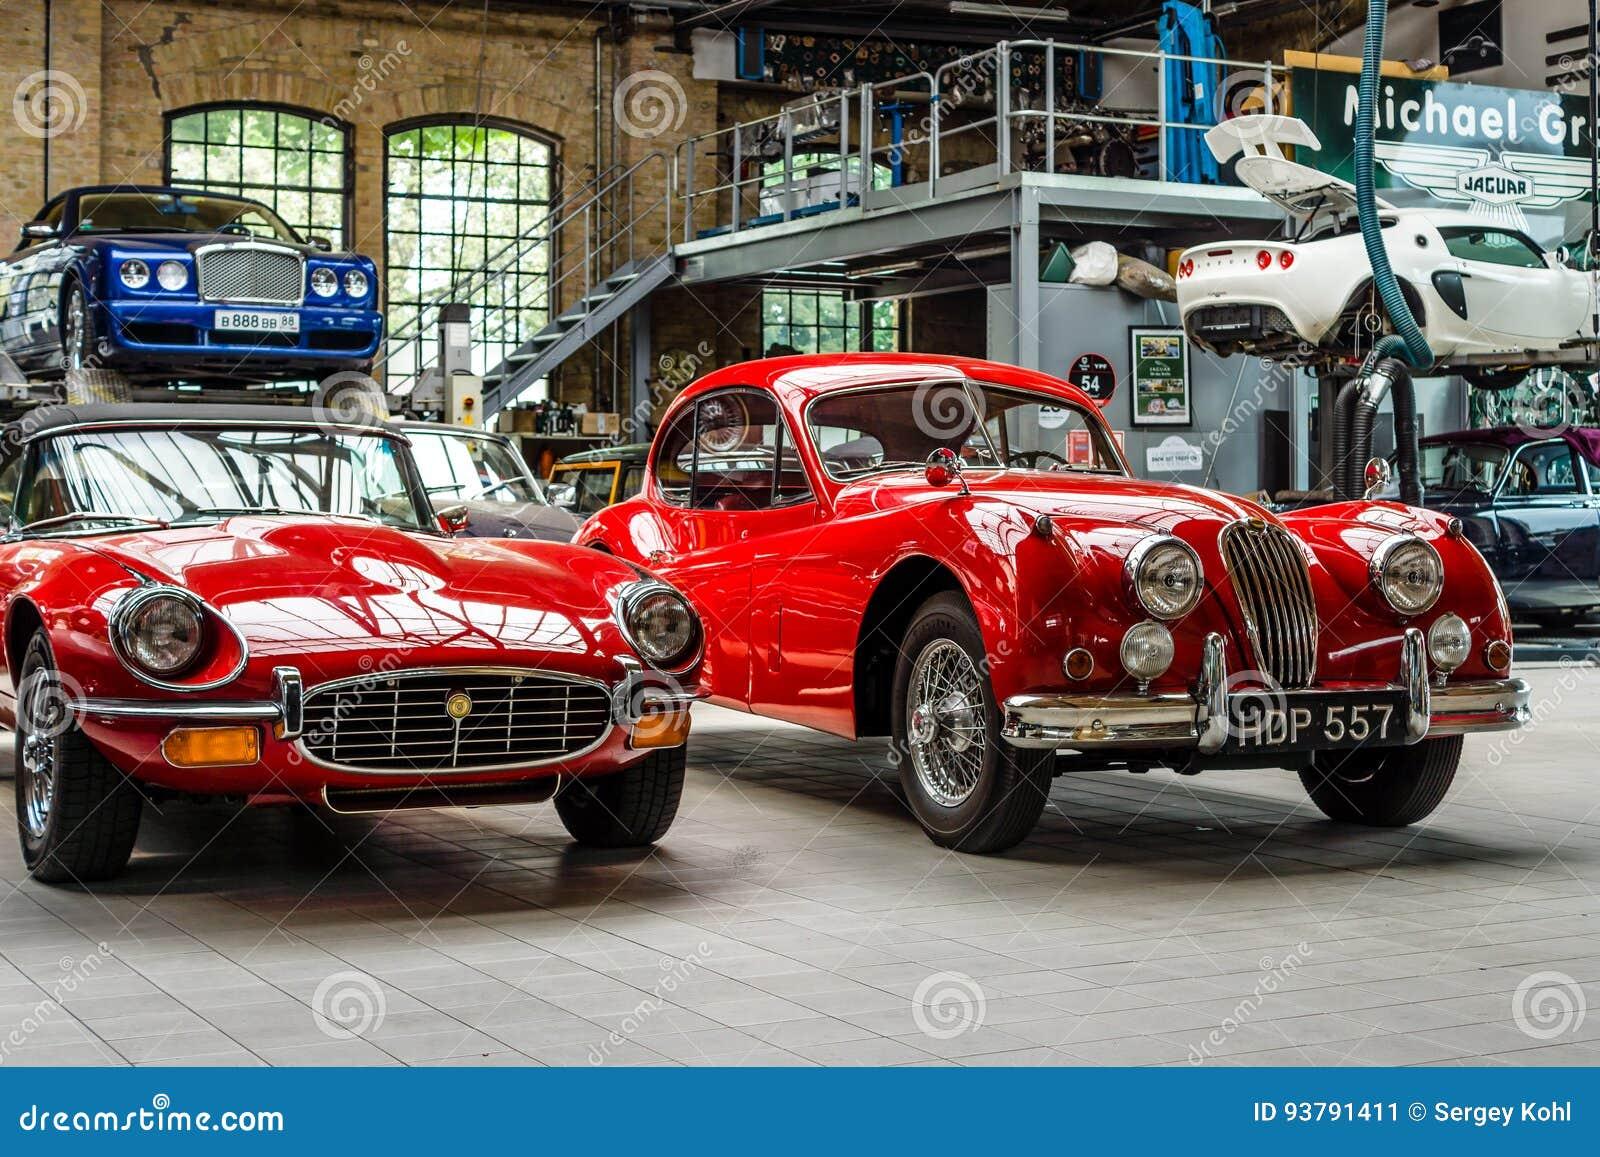 Classic Car Maintenance : Car workshop for repair and maintenance of retro cars